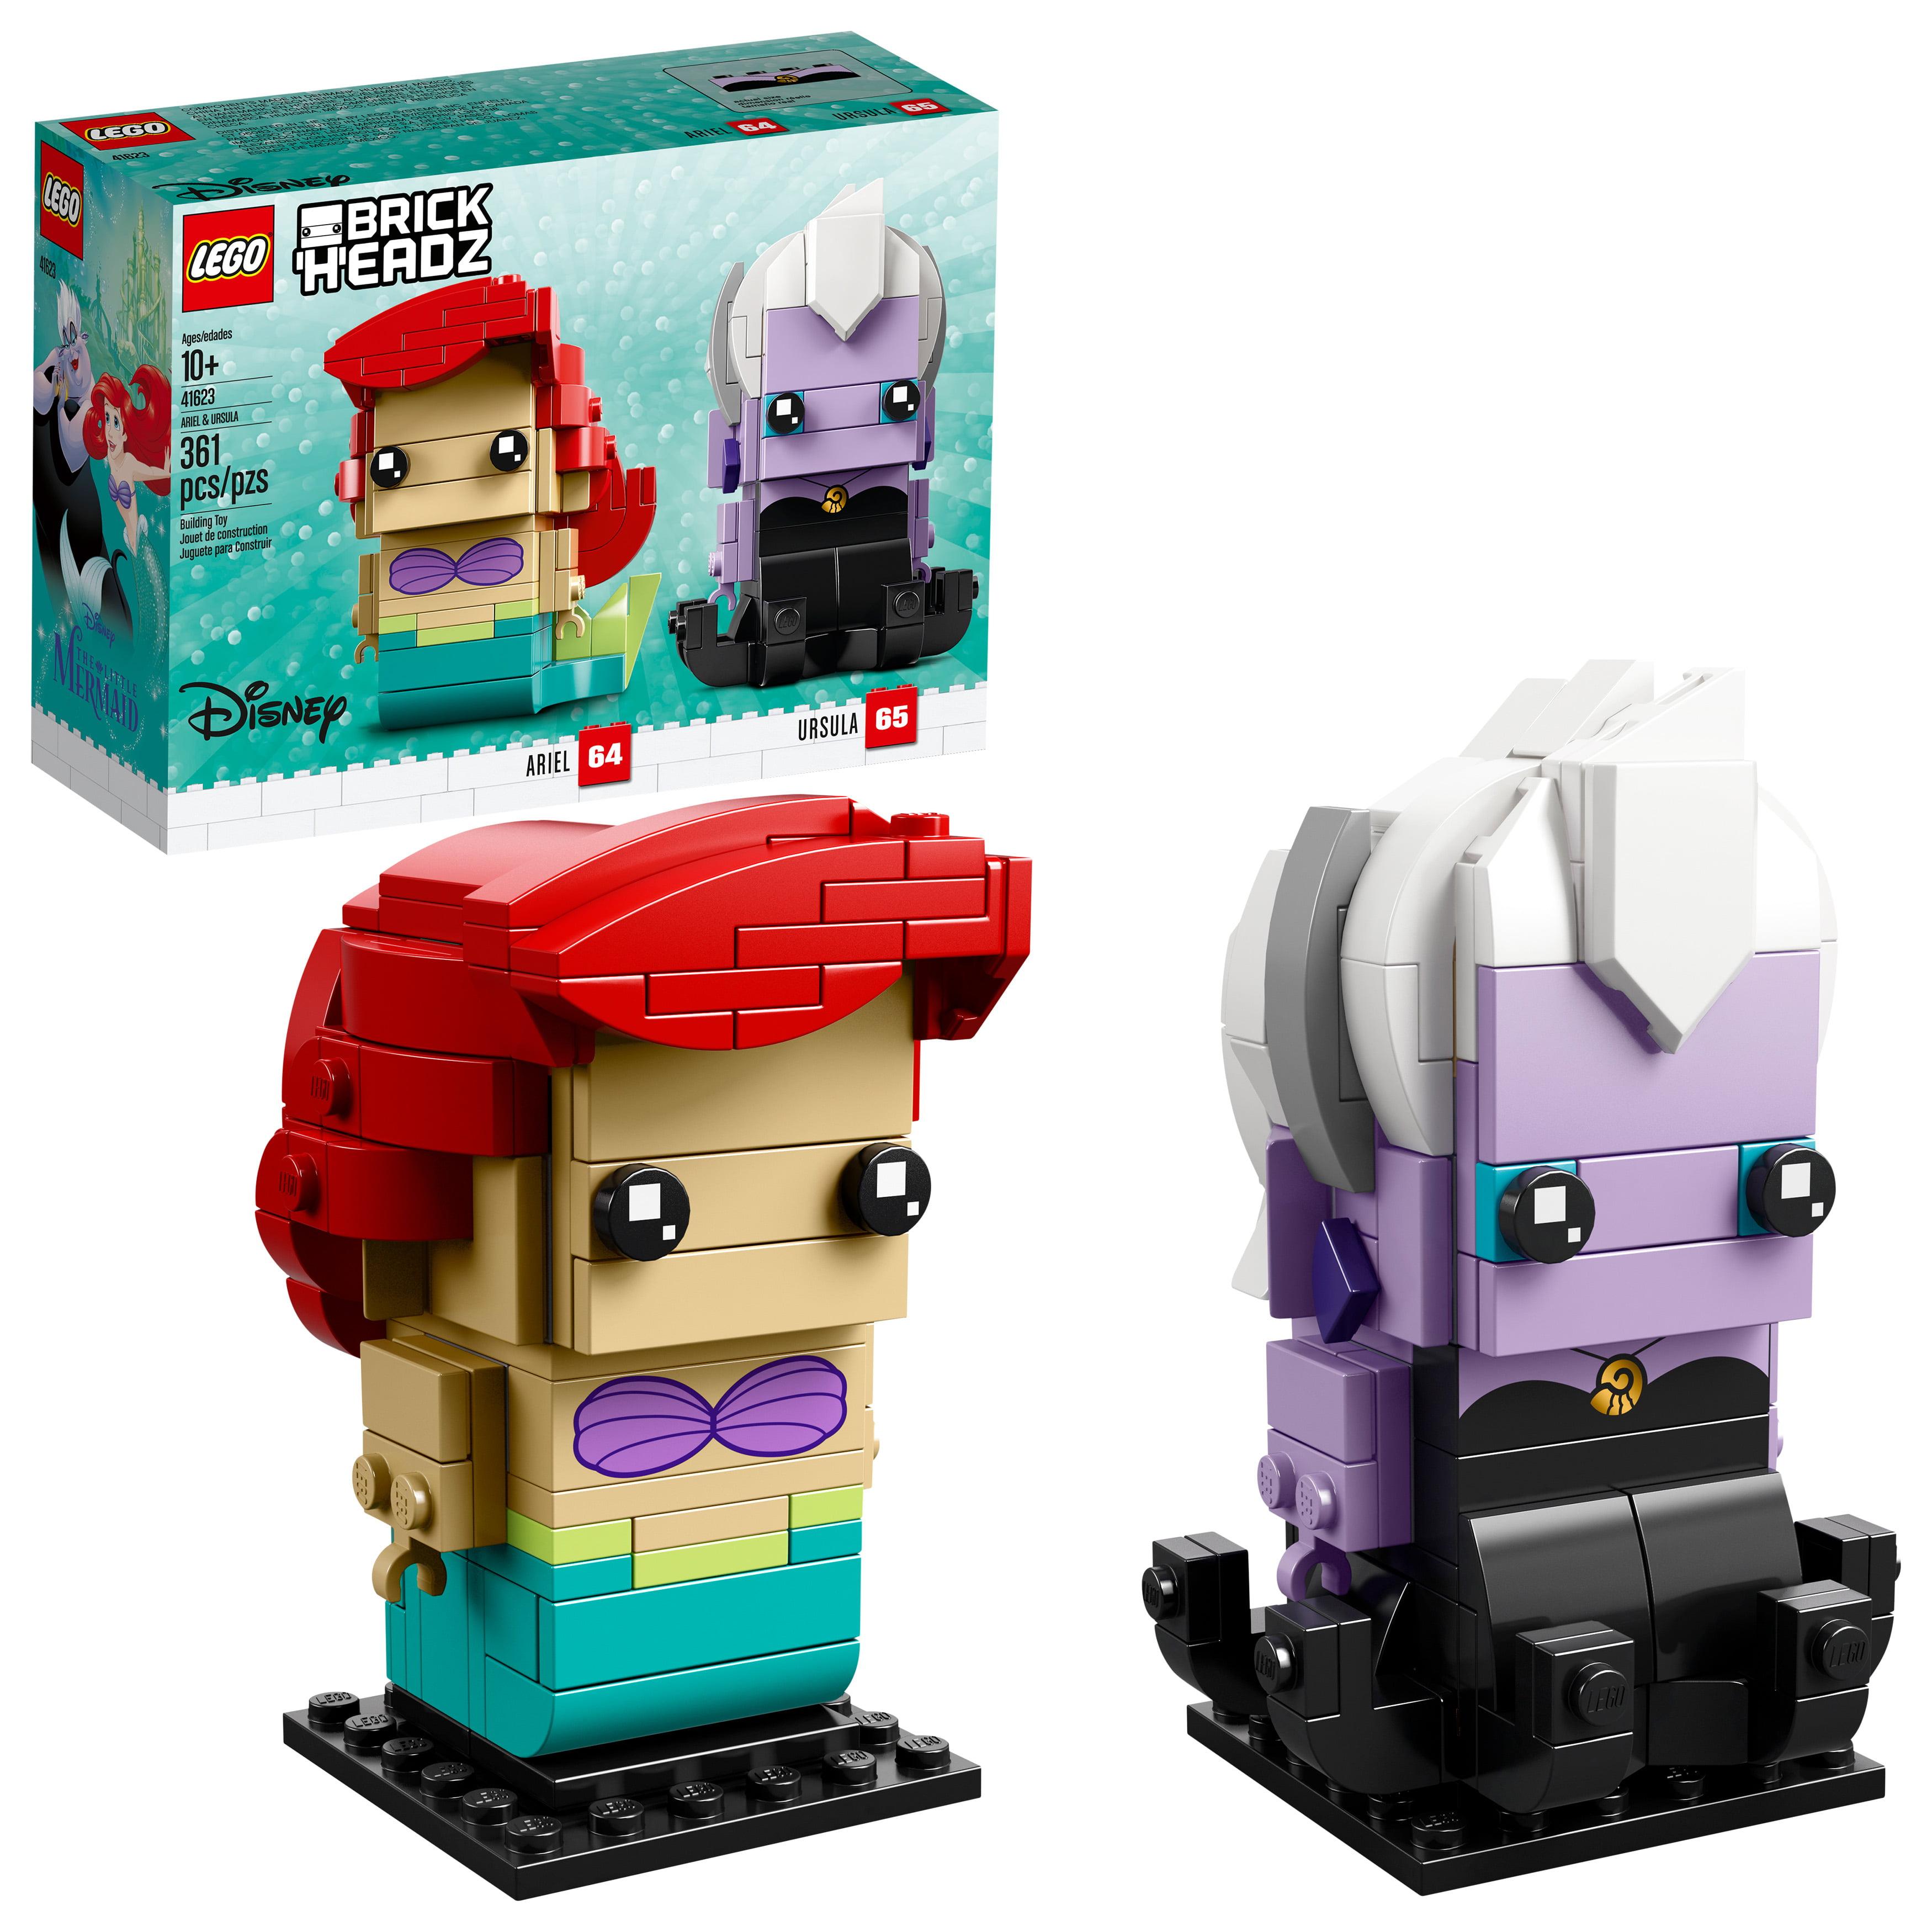 LEGO BrickHeadz Ariel & Ursula 41623 Building Set (361 Pieces)